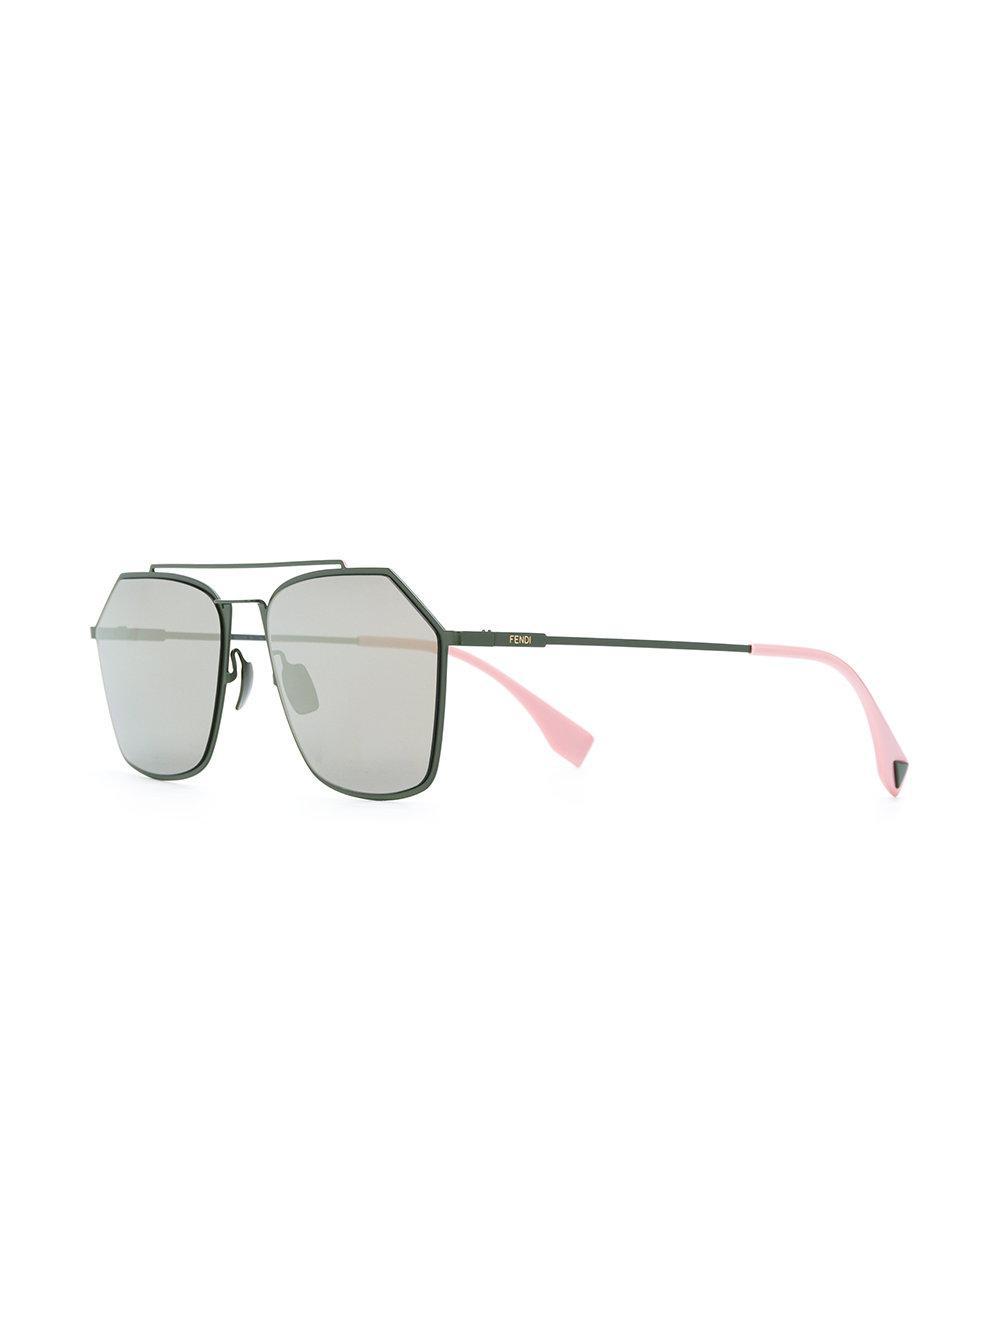 7f769089cde Fendi Pentagon Aviator Sunglasses in Green - Lyst